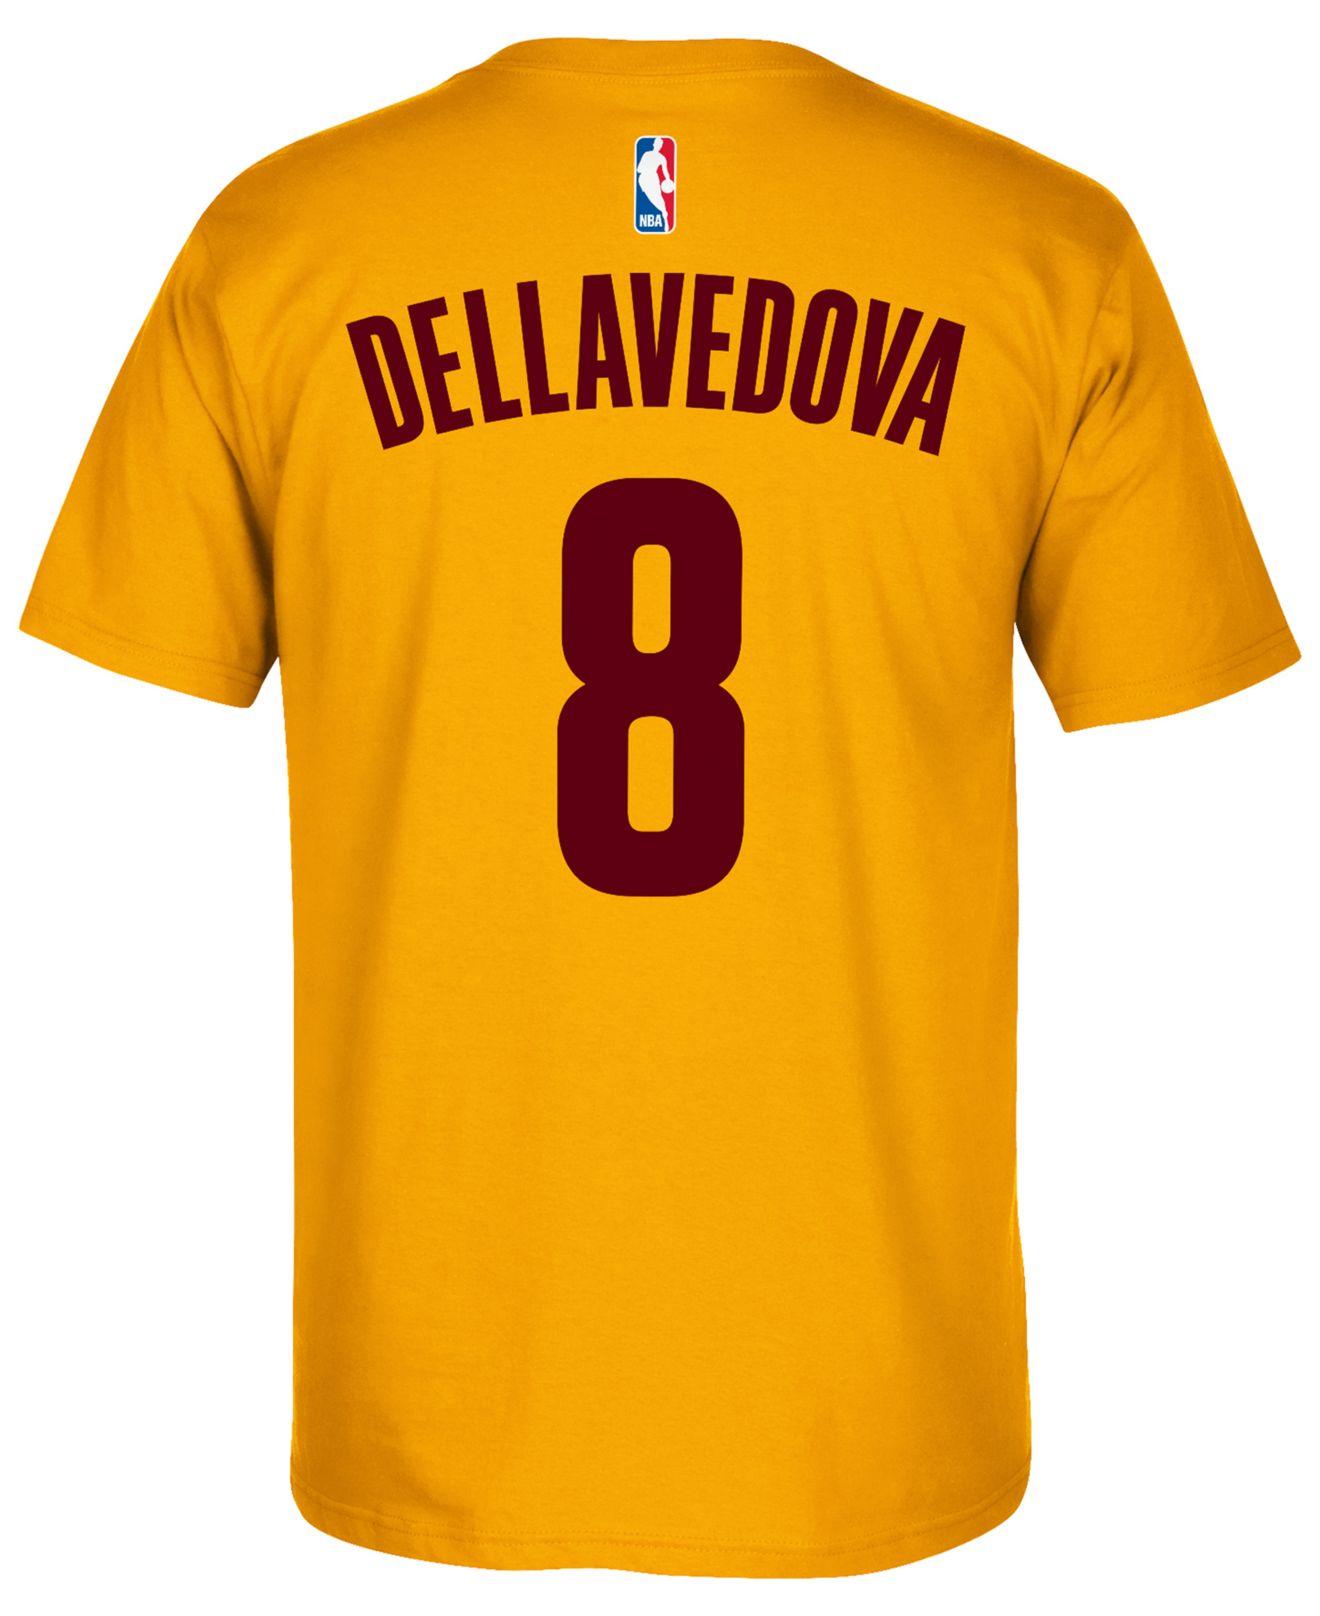 best website 4c607 70fcb Metallic Men's Matthew Dellavedova Cleveland Cavaliers Player T-shirt